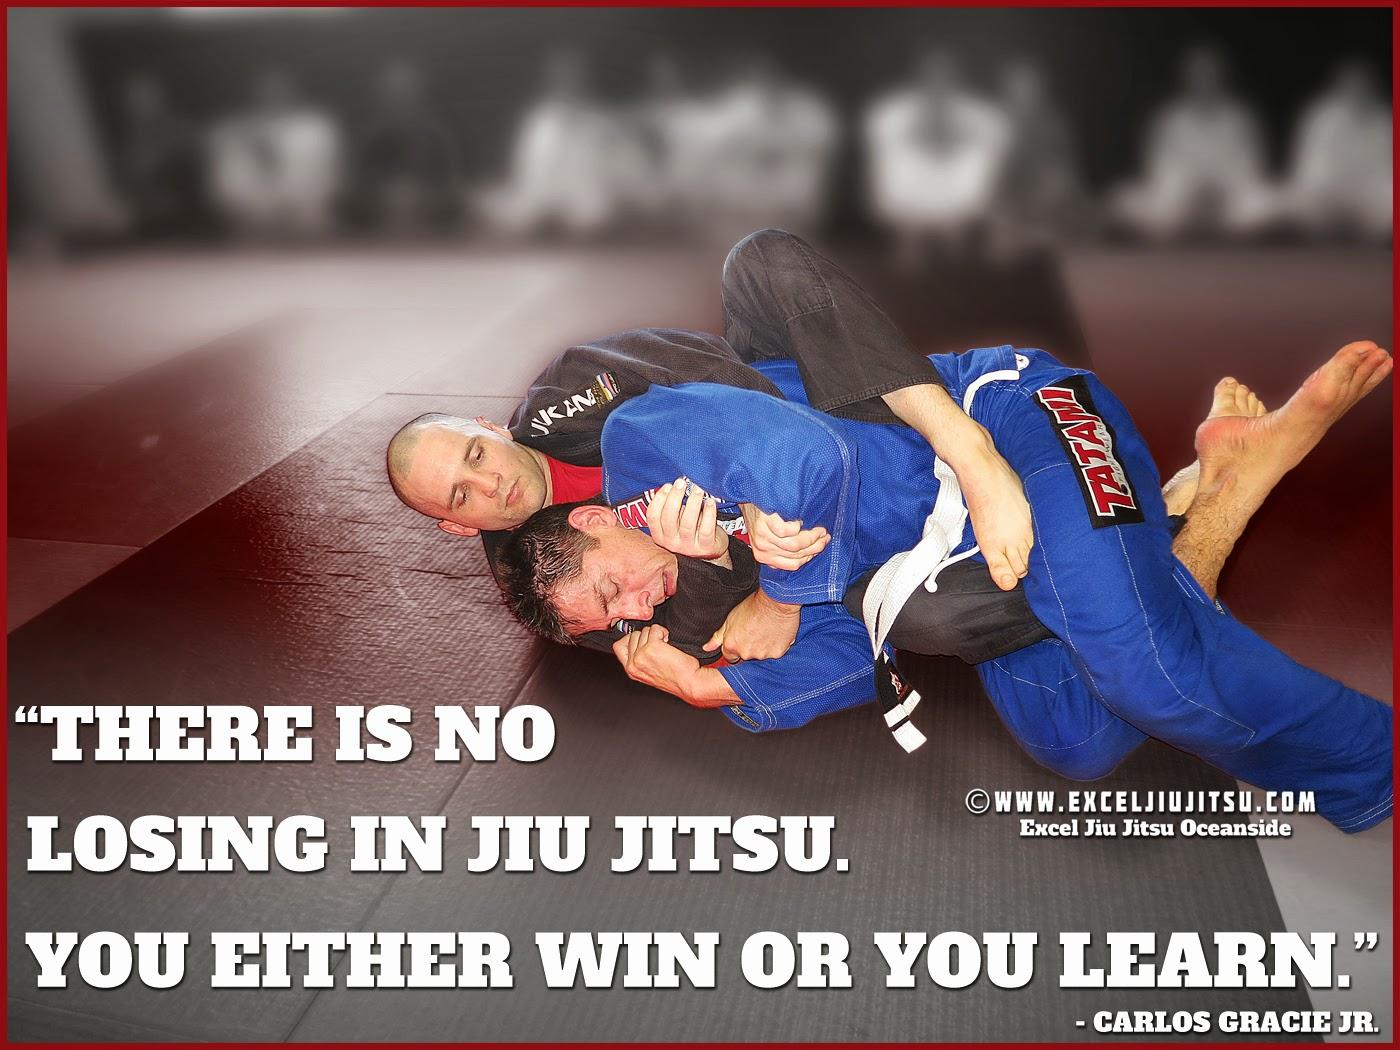 50 ] jiu jitsu wallpaper on wallpapersafari  arte suave jiu jitsu lifestyle audiomack.php #13